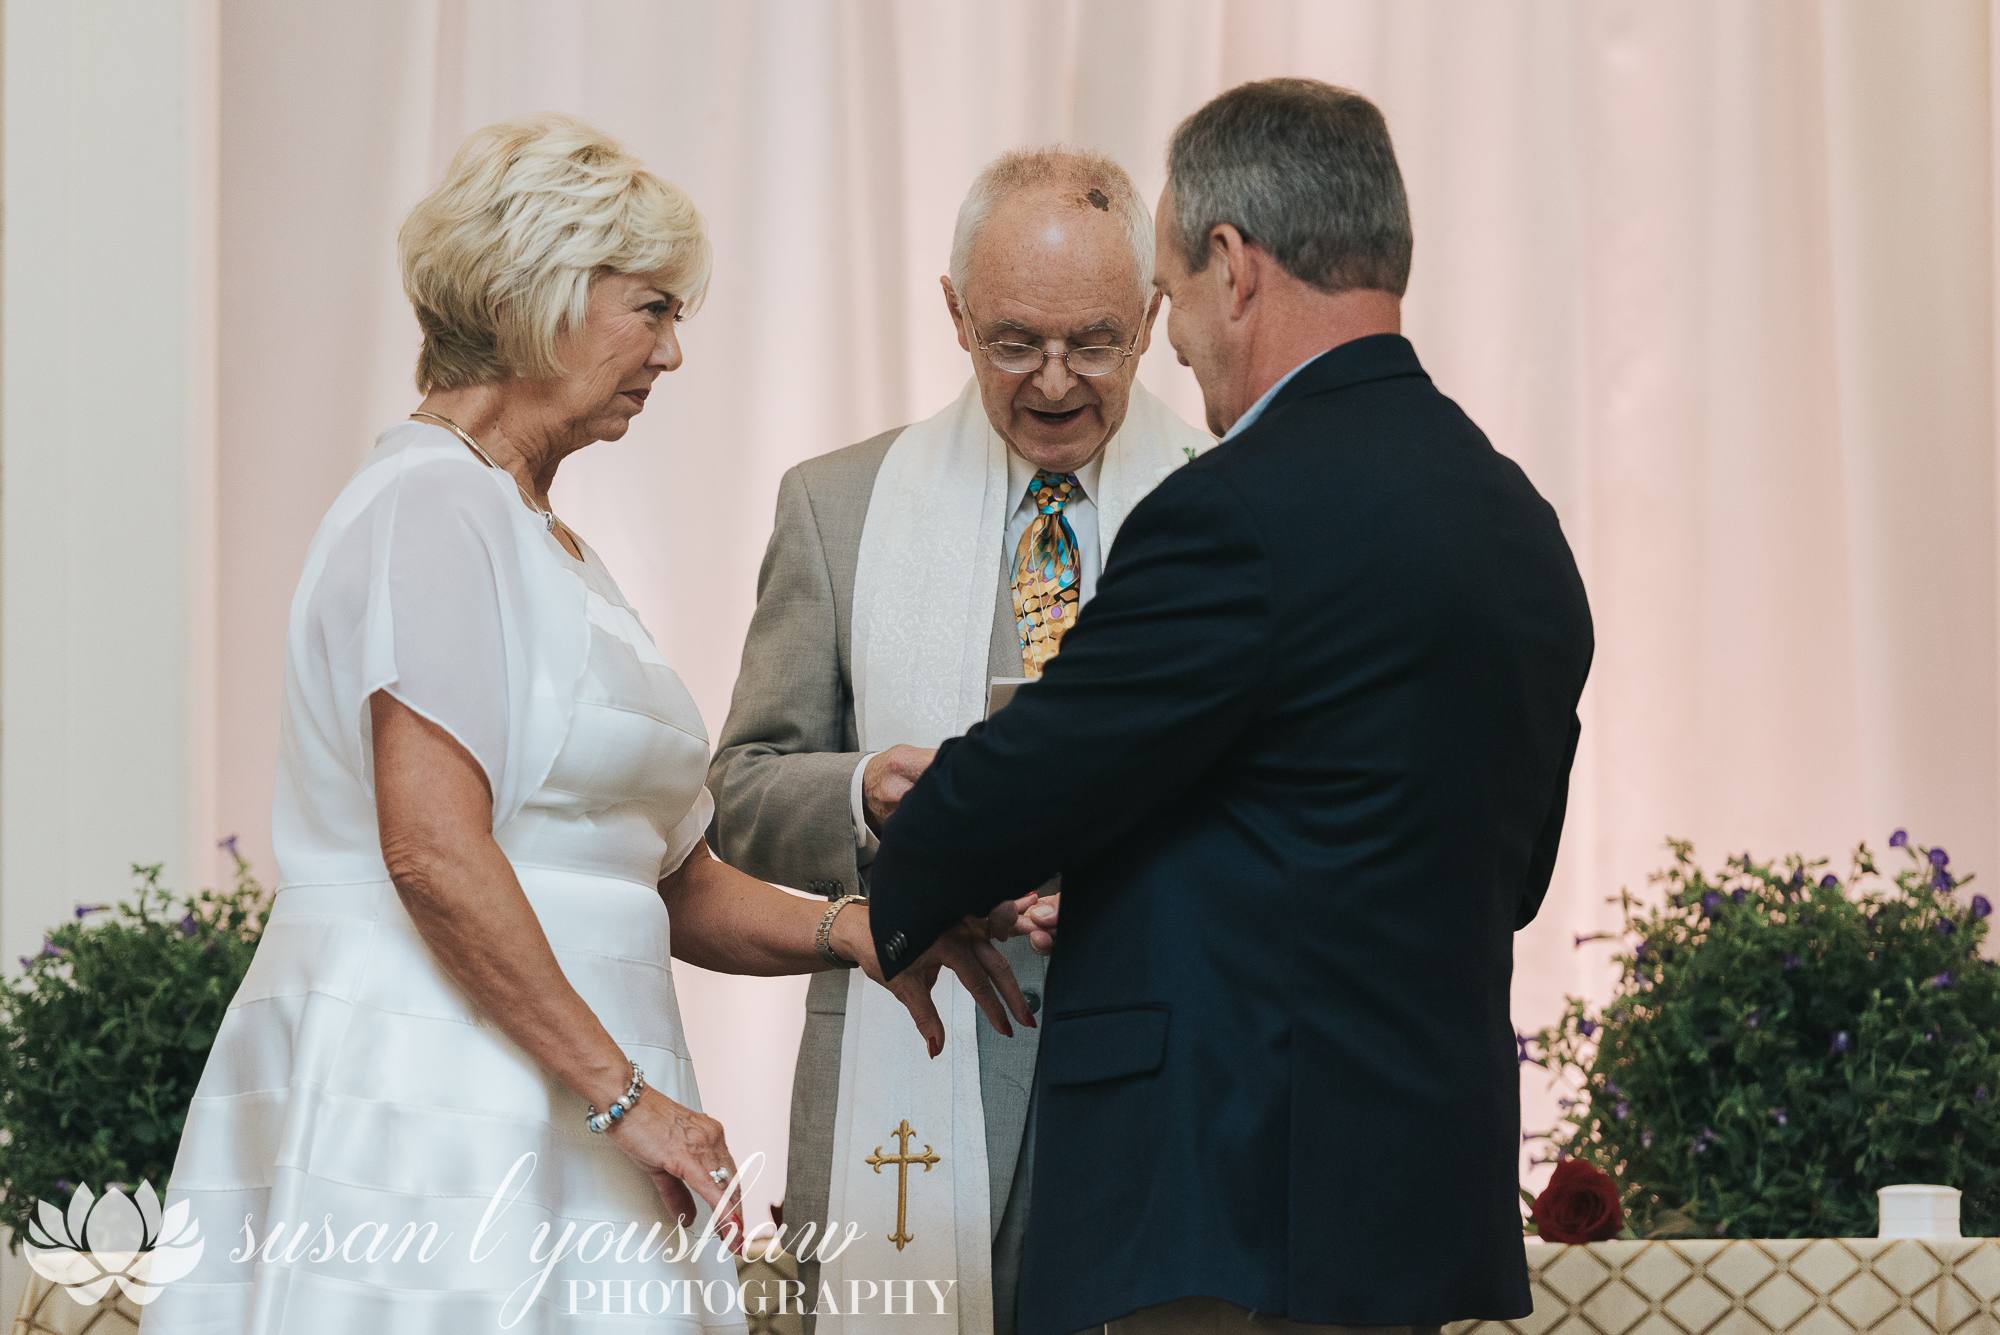 BLOG Carolyn Adams and Jim McCune 07-04-2018 SLY Photography-86.jpg